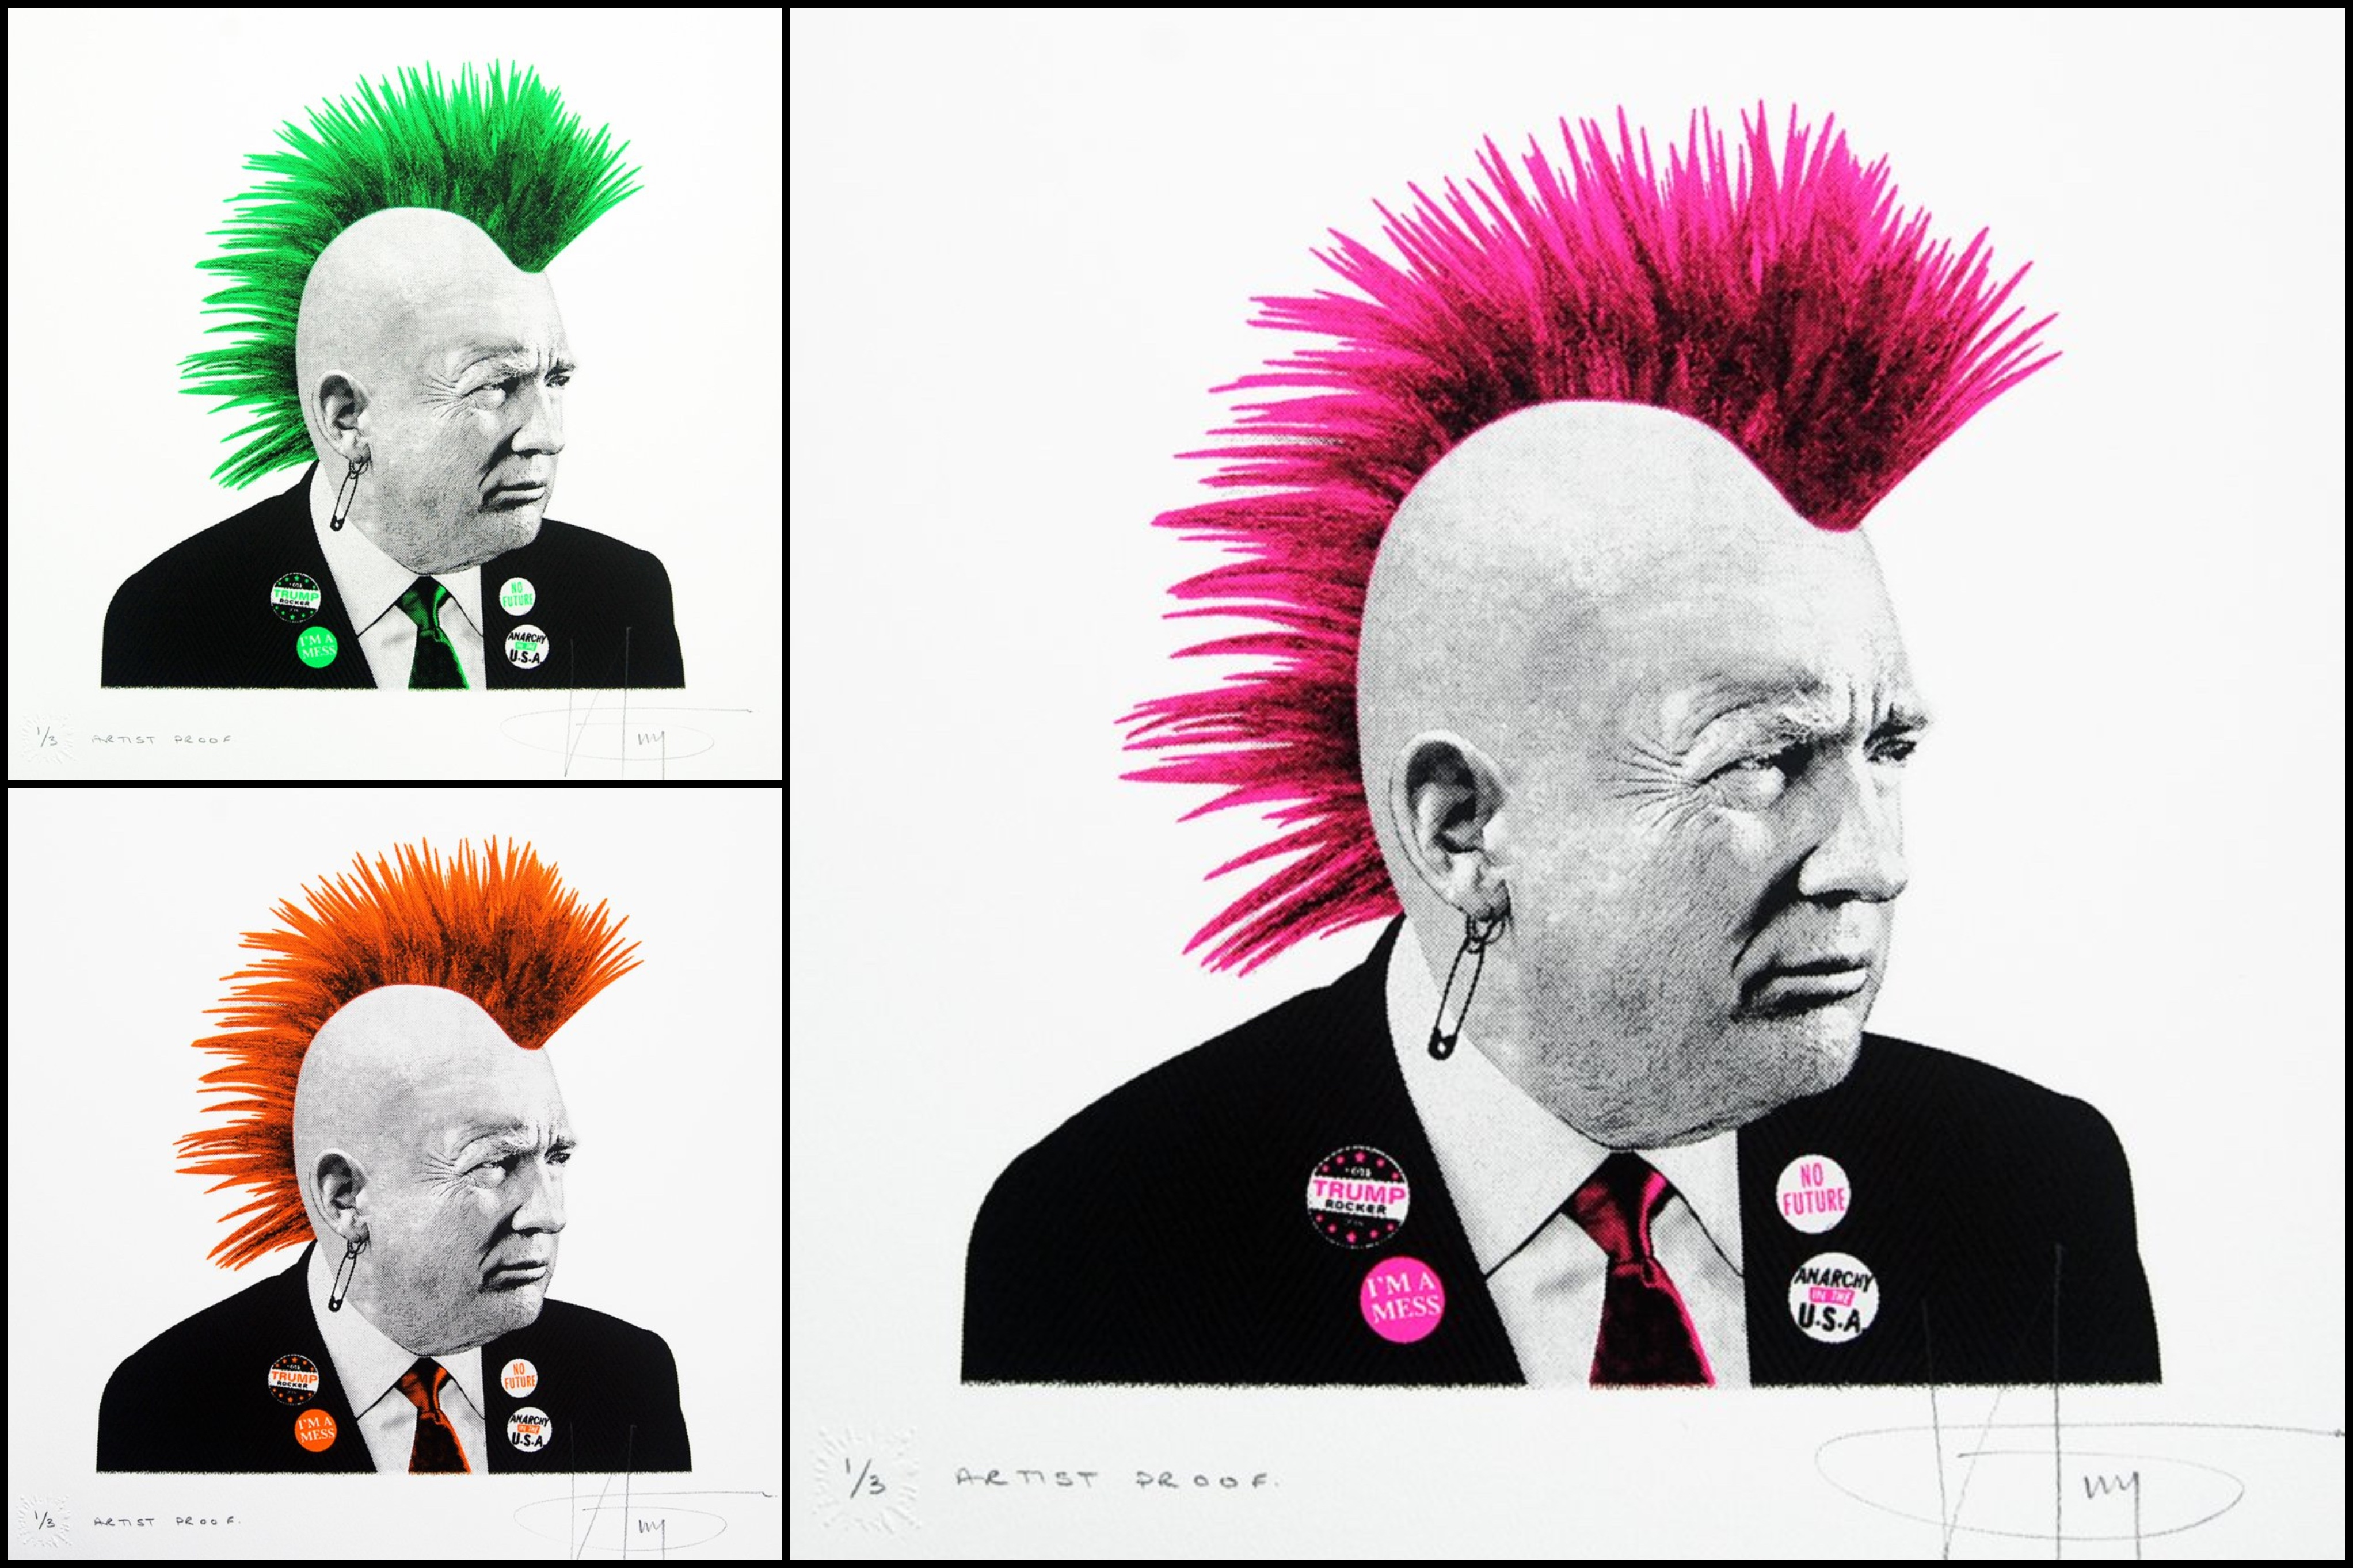 K-Guy - Punk Trump Collage 2.jpg